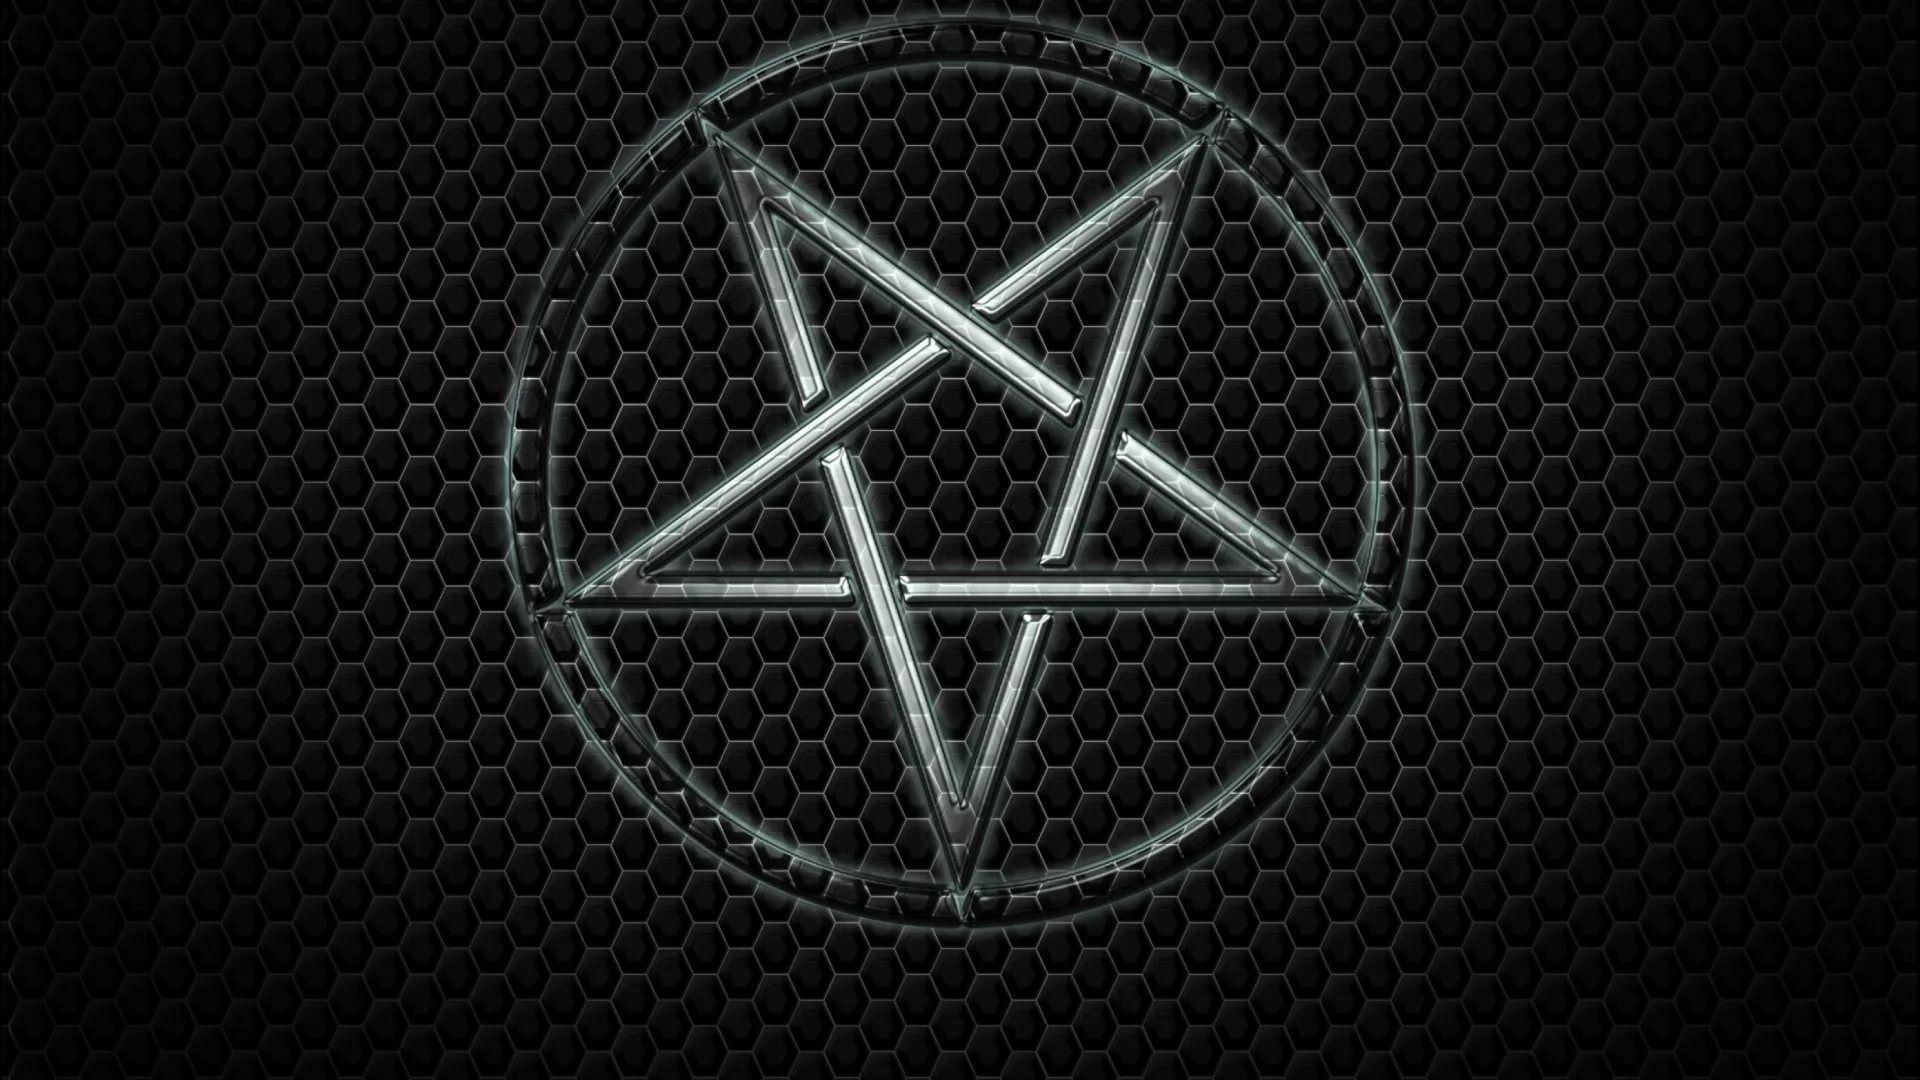 Pentagram Background Wallpaper HD